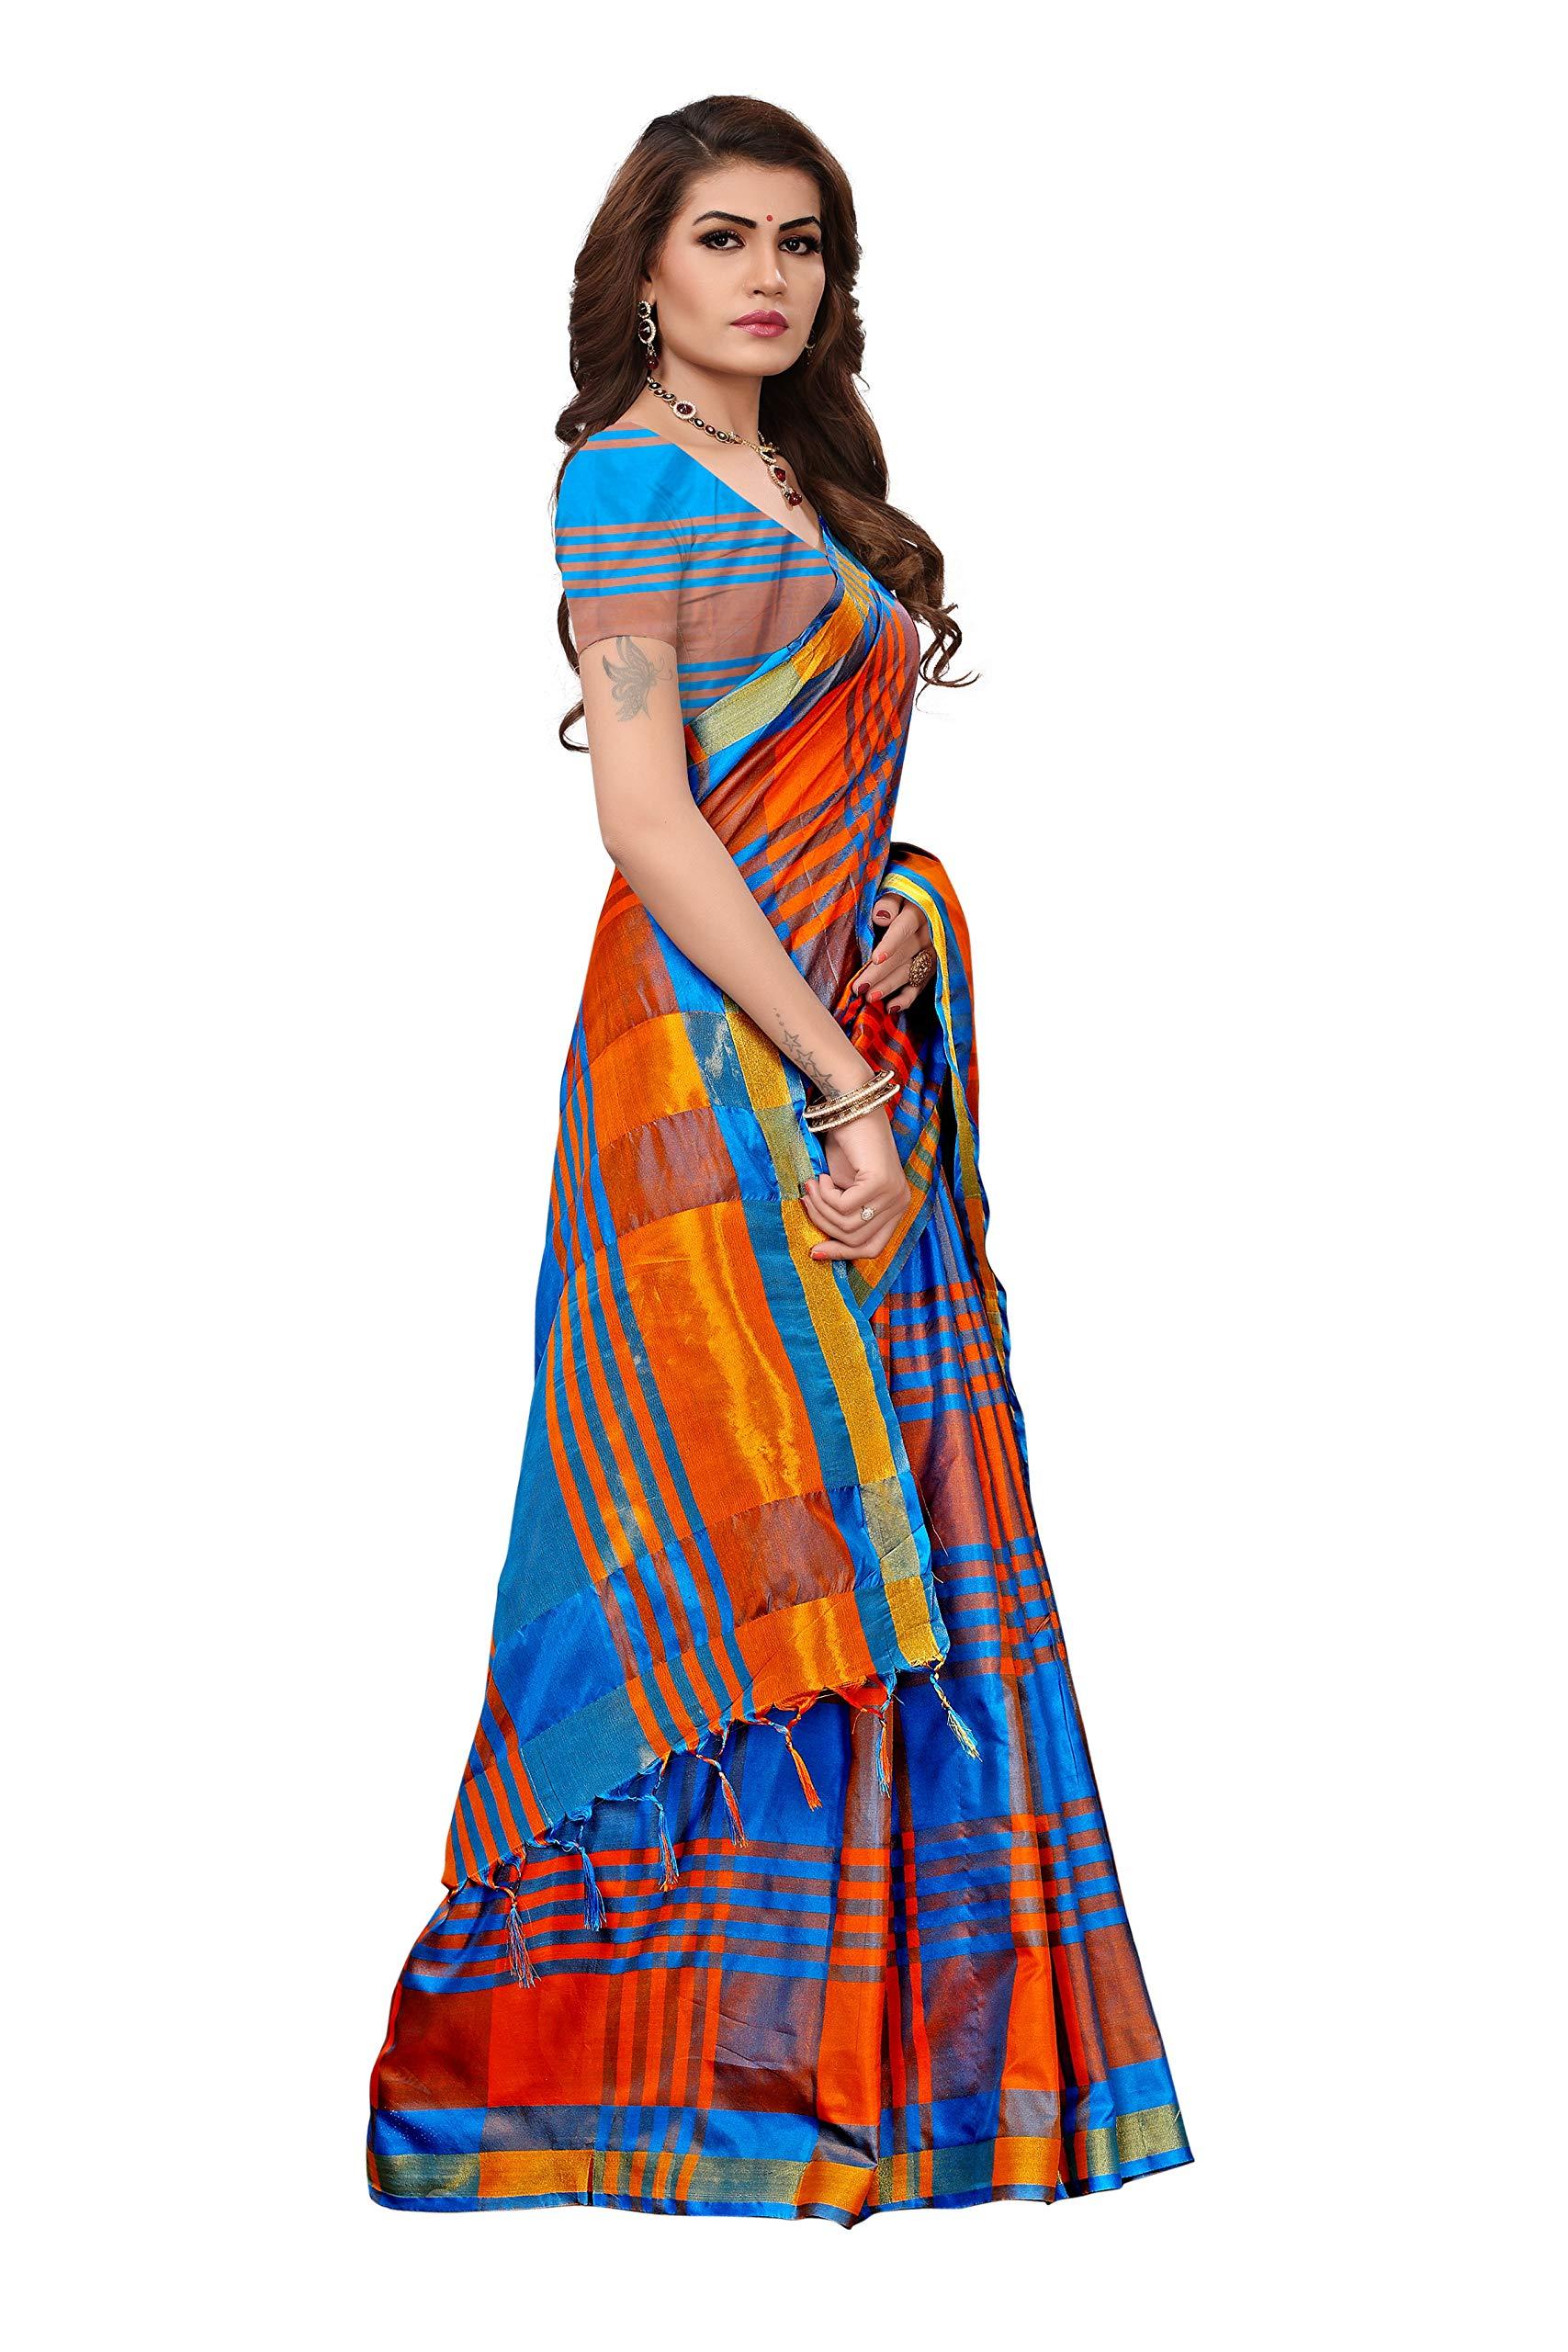 a1f30739c1fc6 Art Décor Multicolor Cotton Silk Saree with Blouse